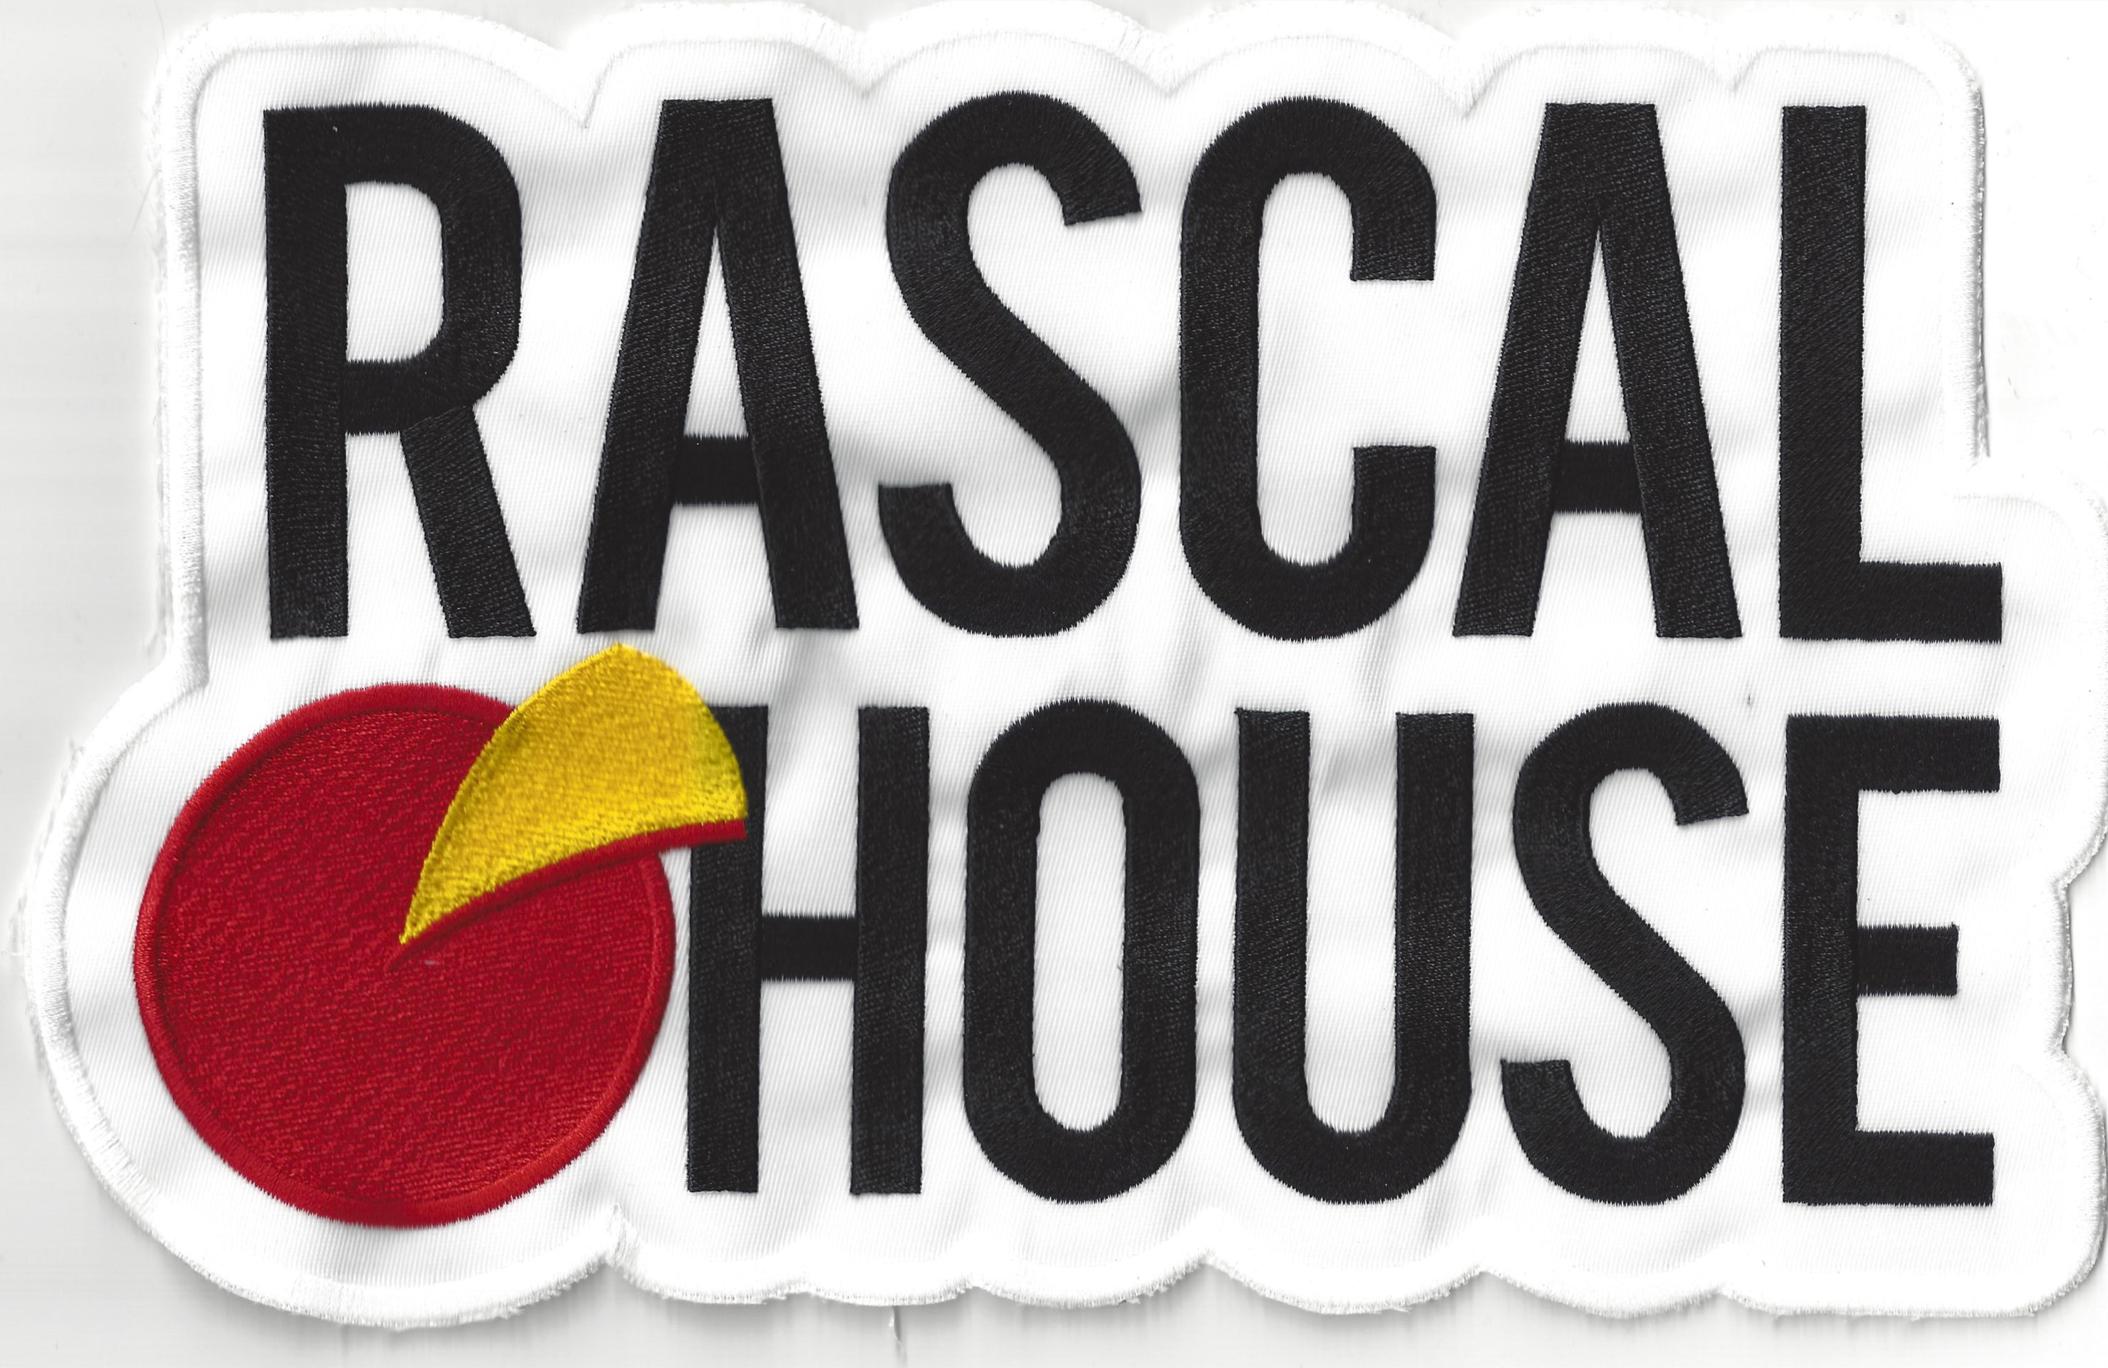 Rascal_House.png